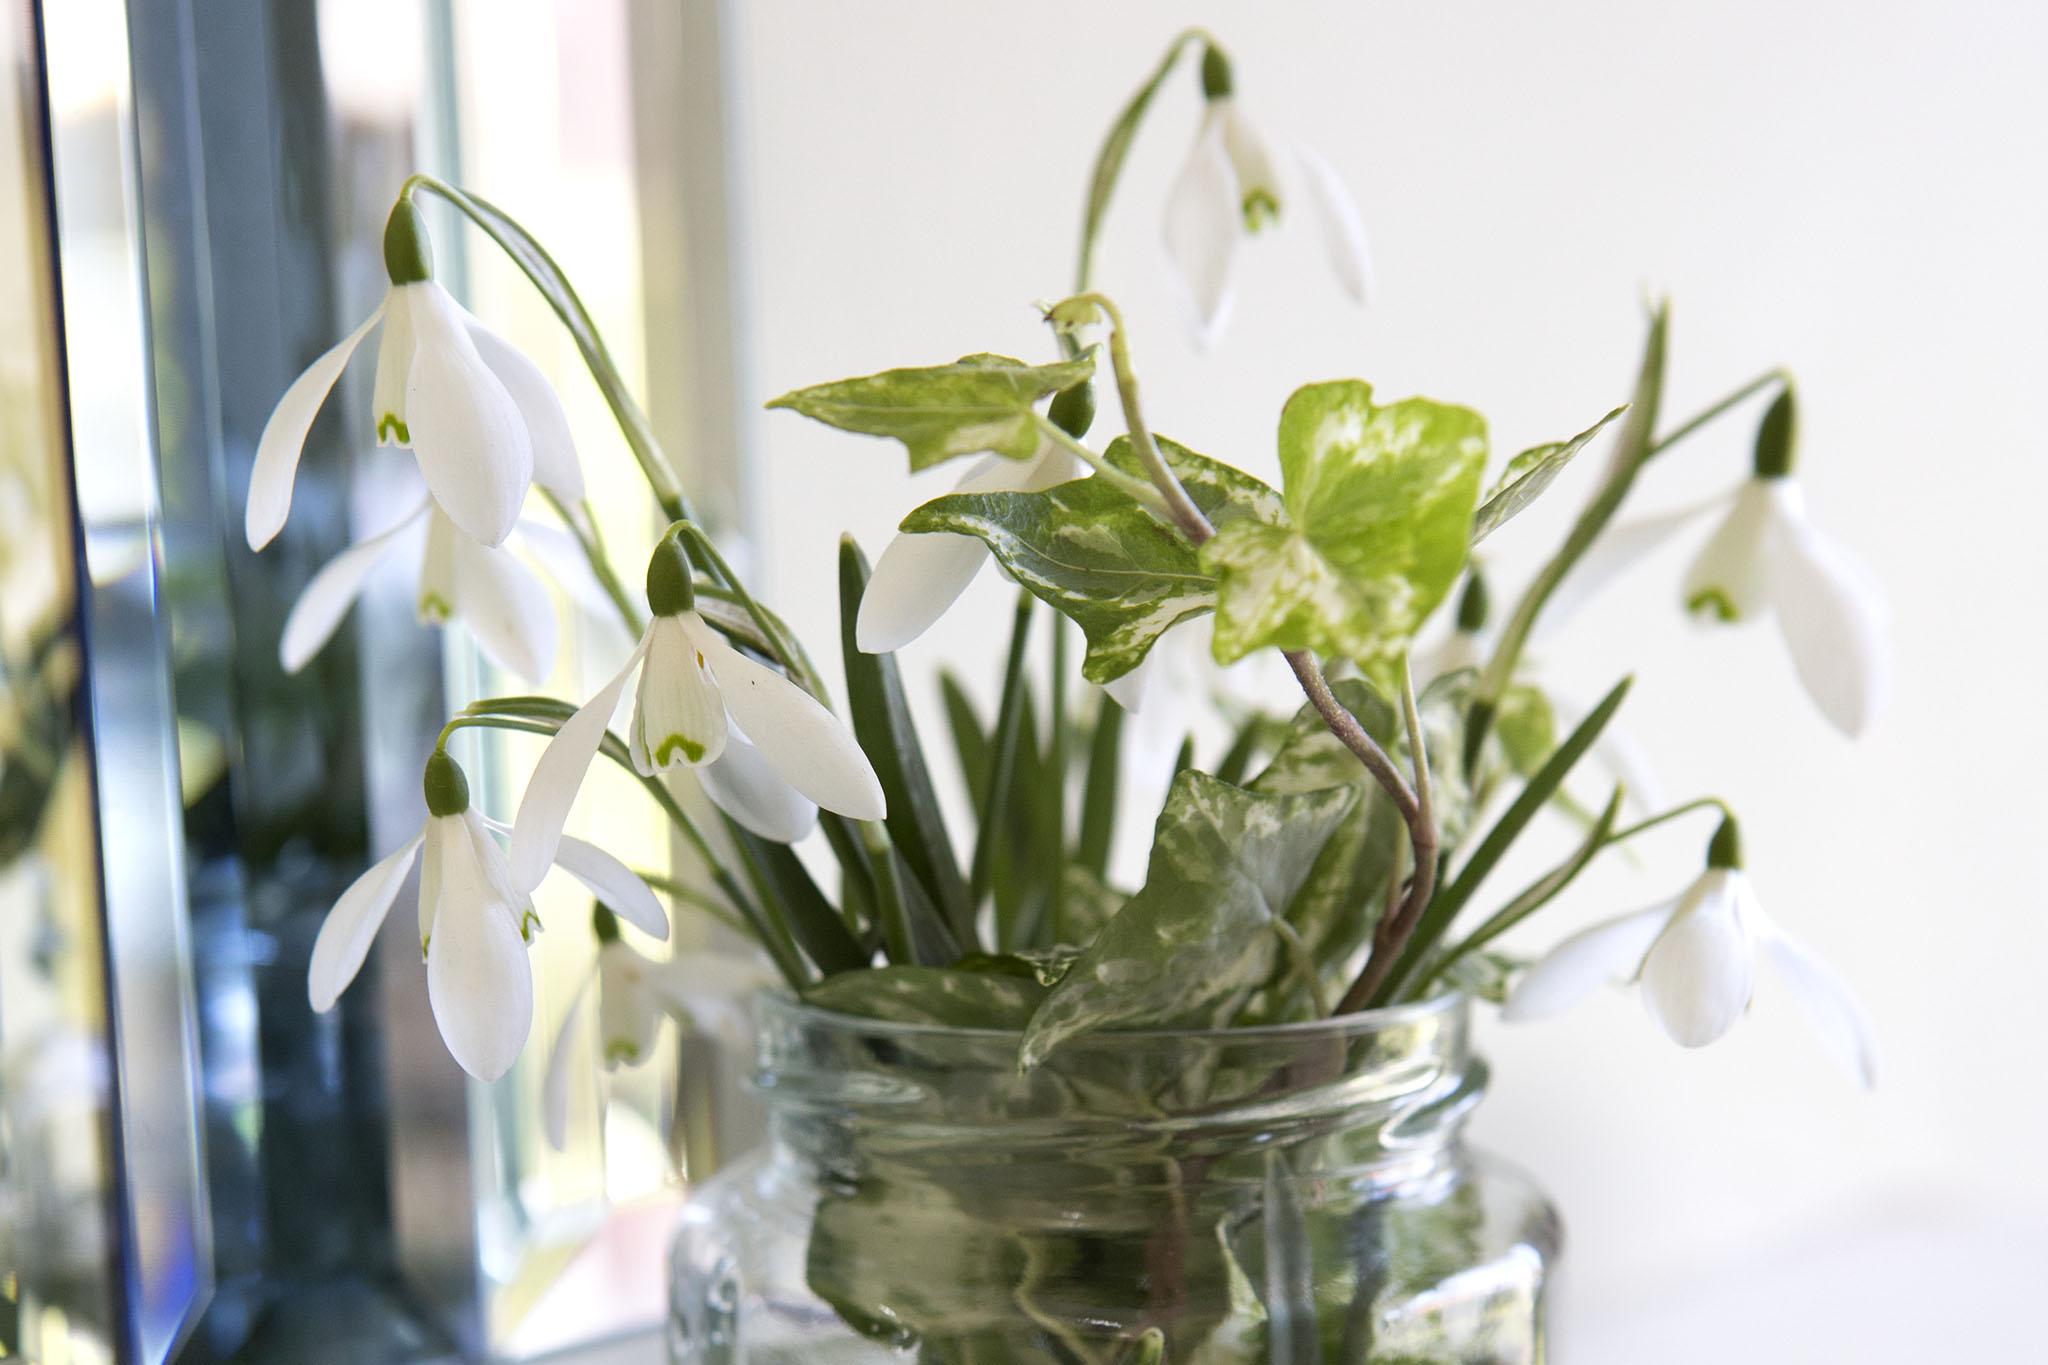 Snowdrop vase display